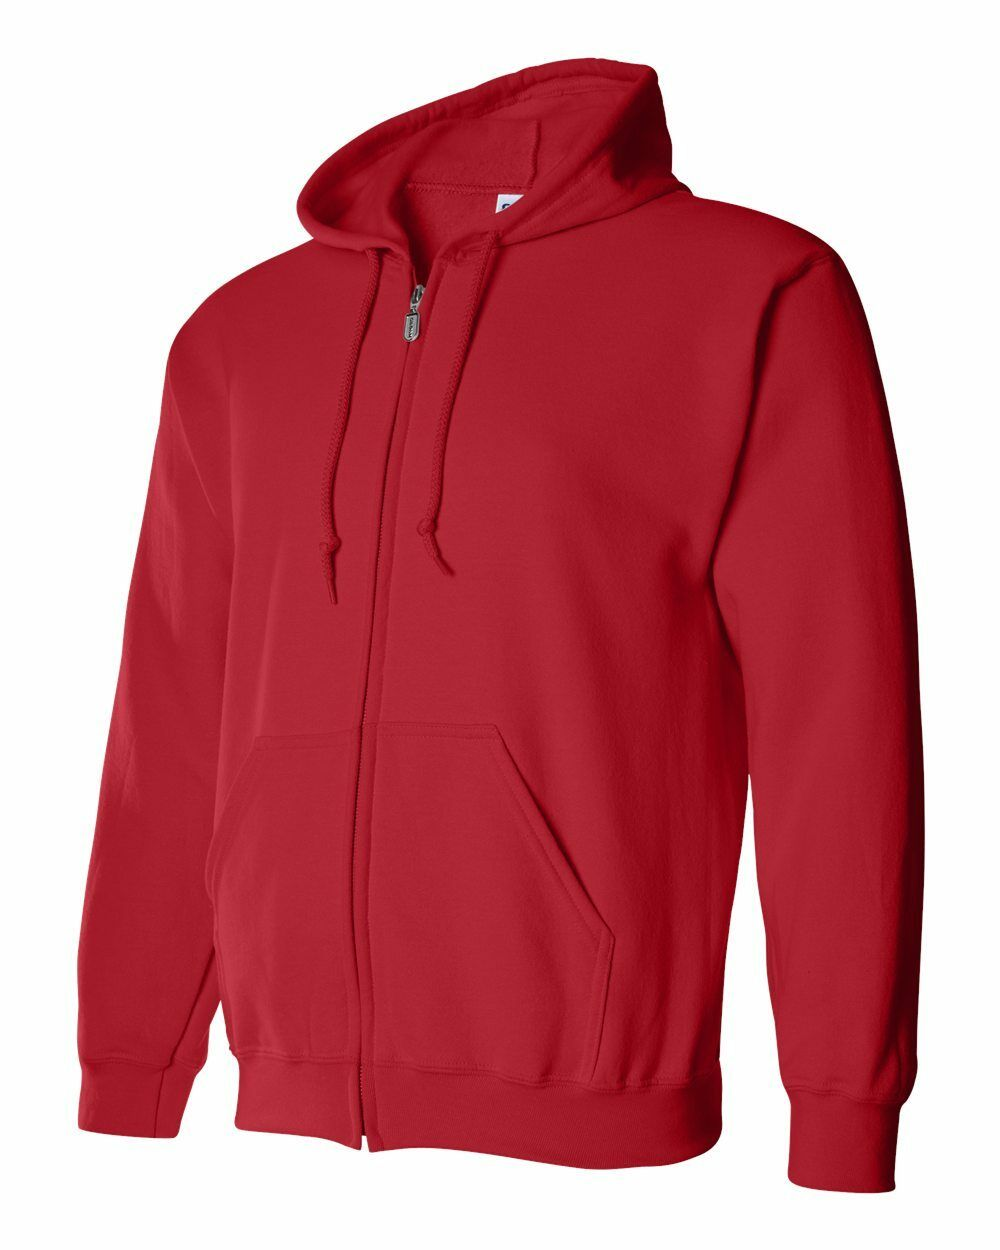 Men/'s BIG TALL LT-XLT 3XLT 4XLT Blend Hooded Sweatshirt PEACHES Hoody Hoodie